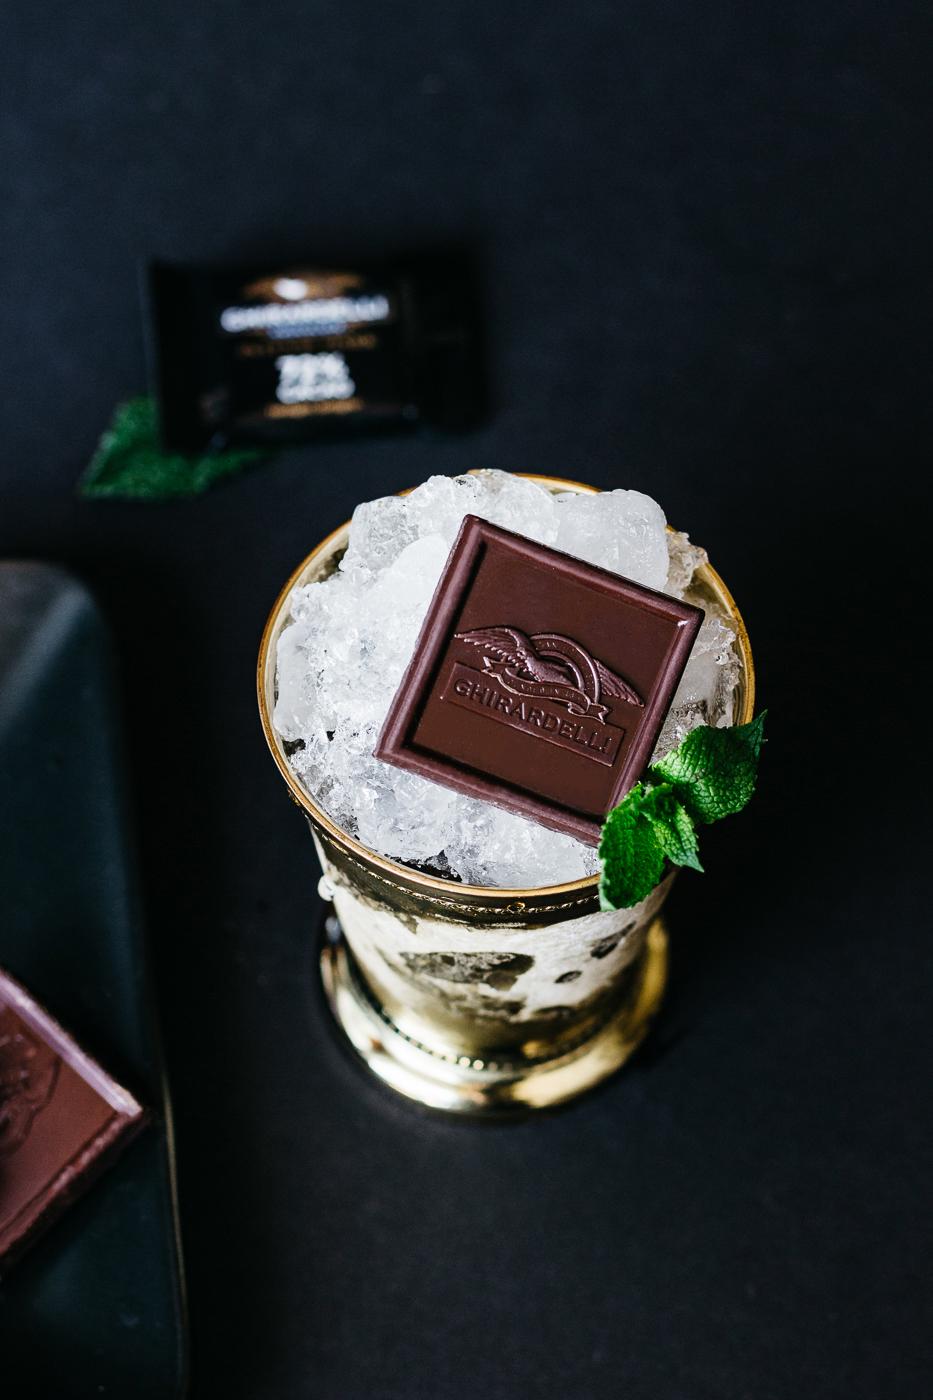 ghirardelli chocolate, bourbon chocolate, kentucky derby party, kentucky derby party cocktails, lifestyle blog